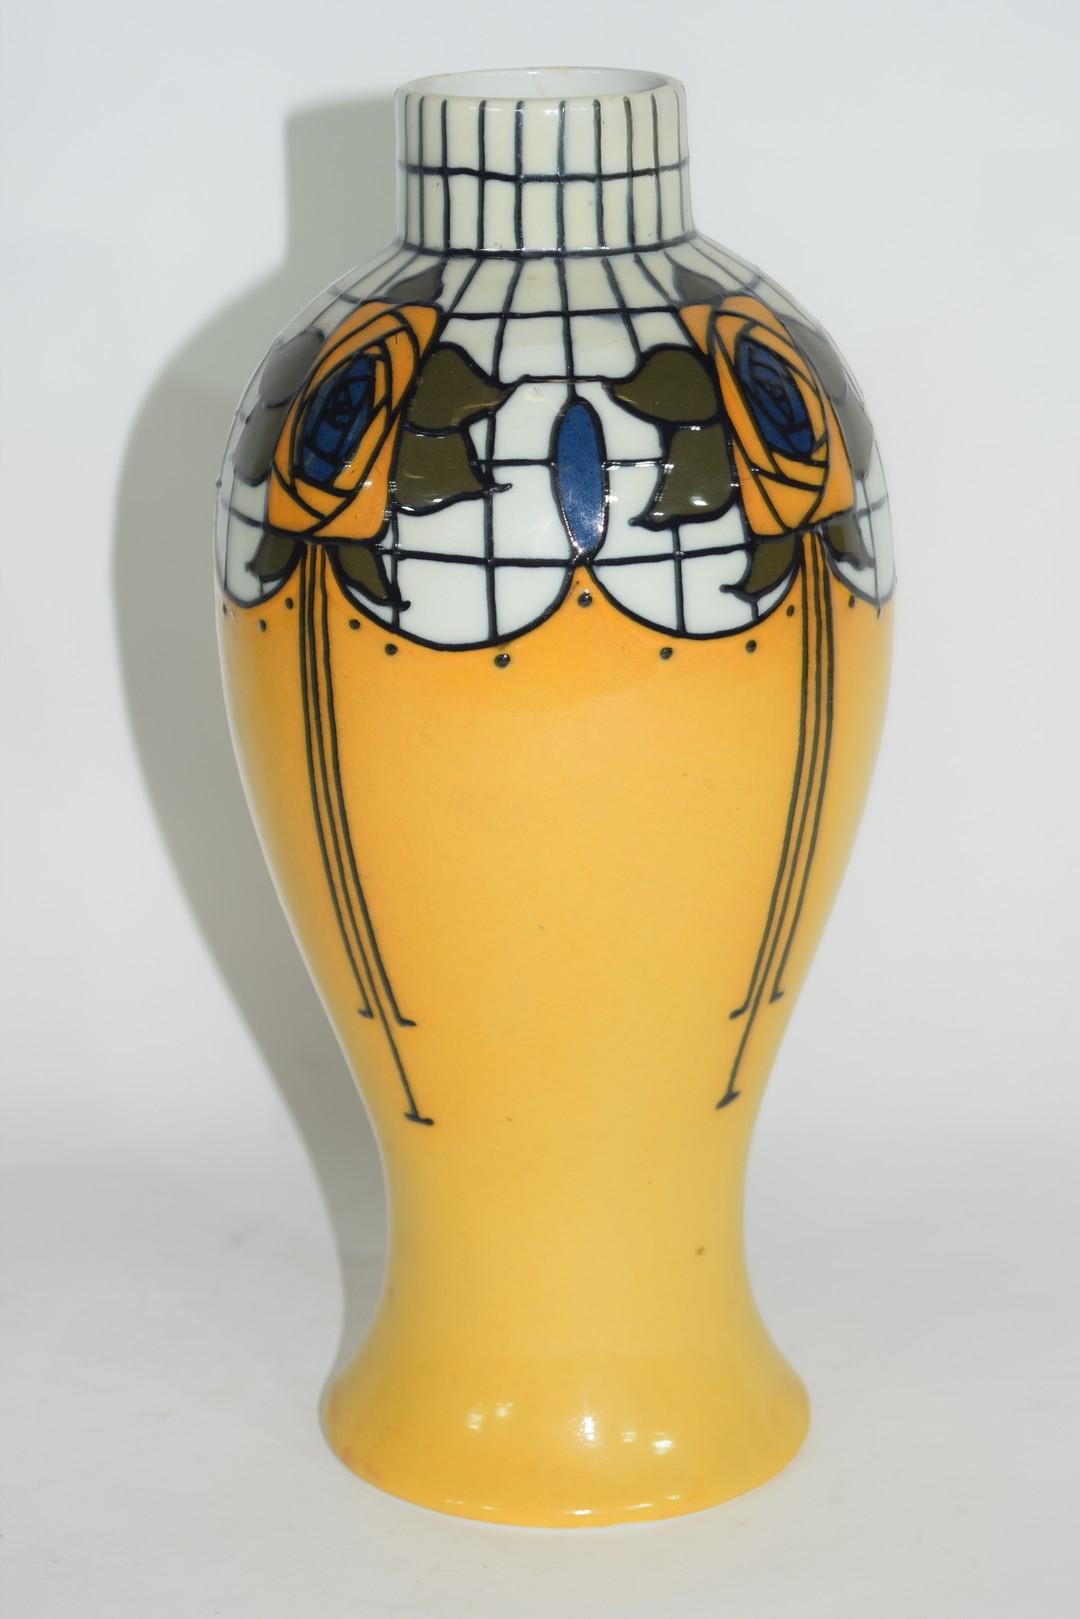 Wood & Sons Burslem vase by Frederick Rhead - Image 3 of 7